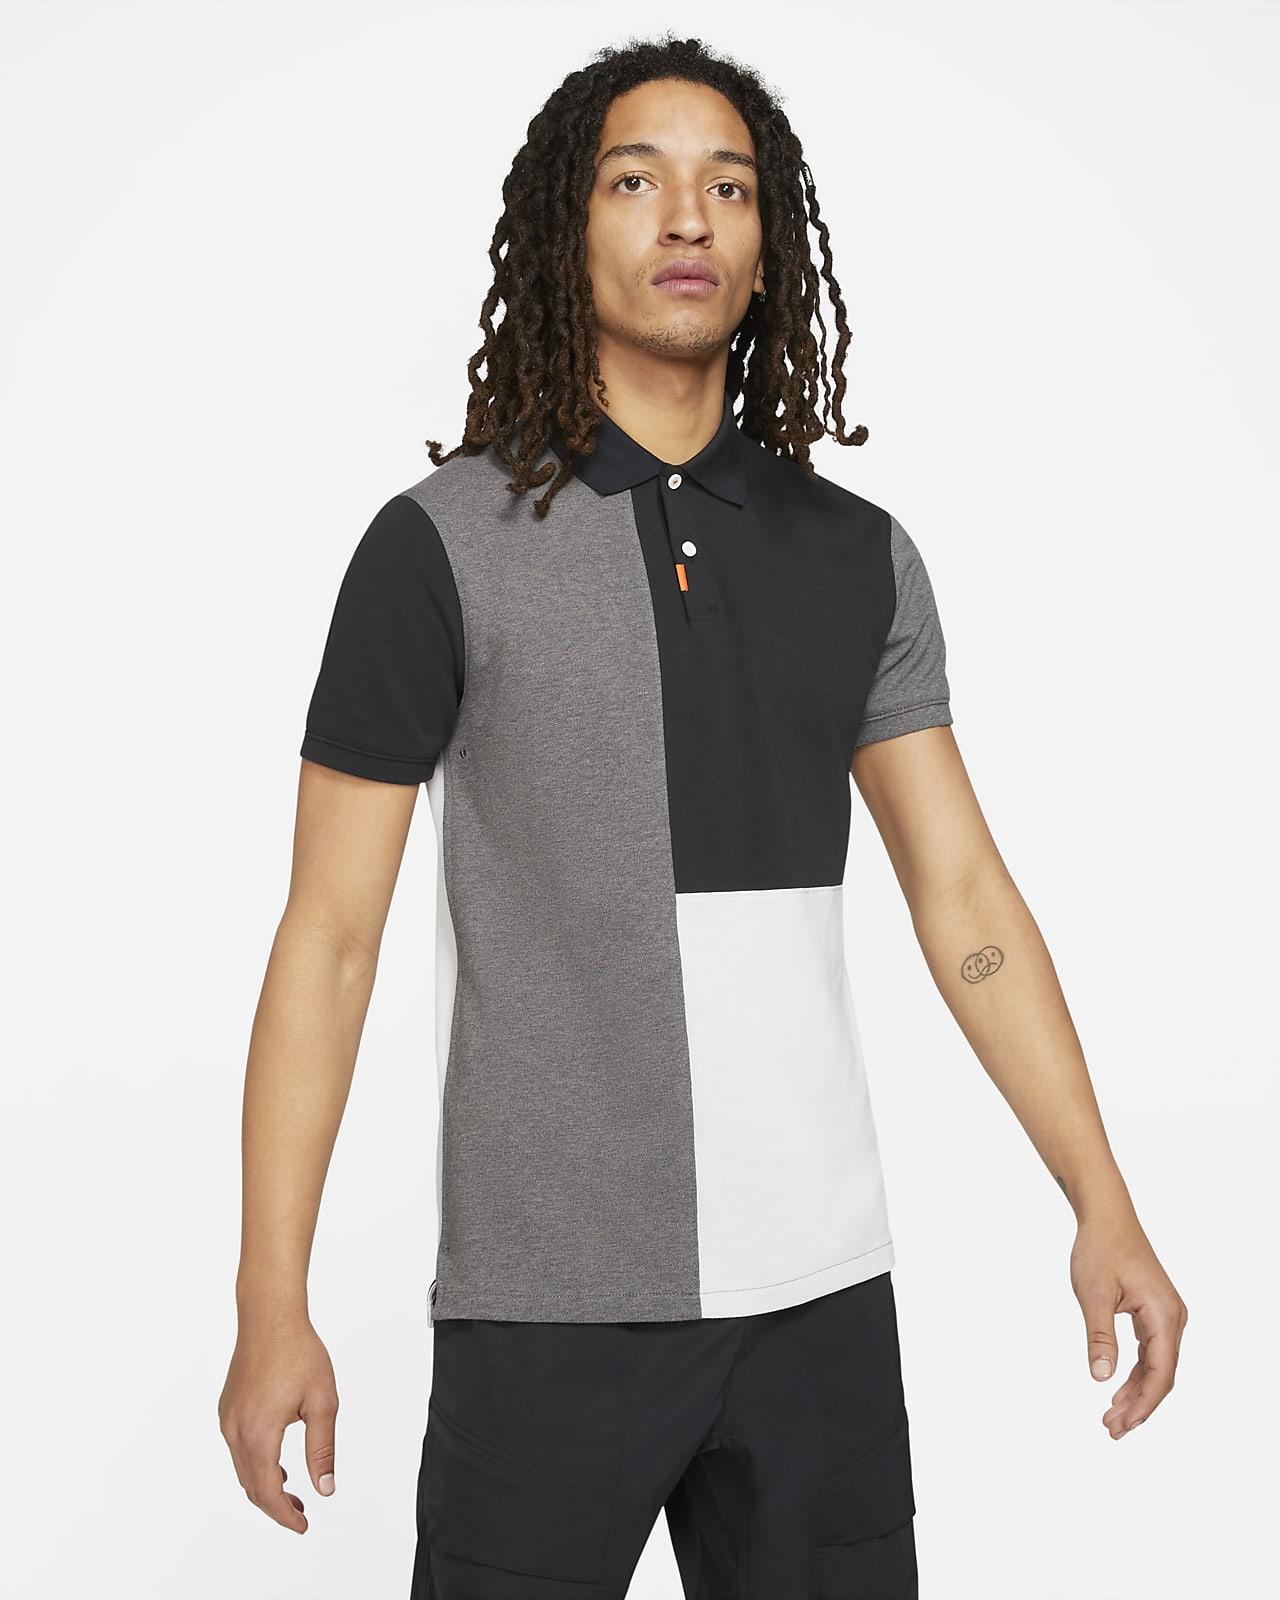 The Nike Polo Herren-Poloshirt in schmaler Passform mit Blockfarben